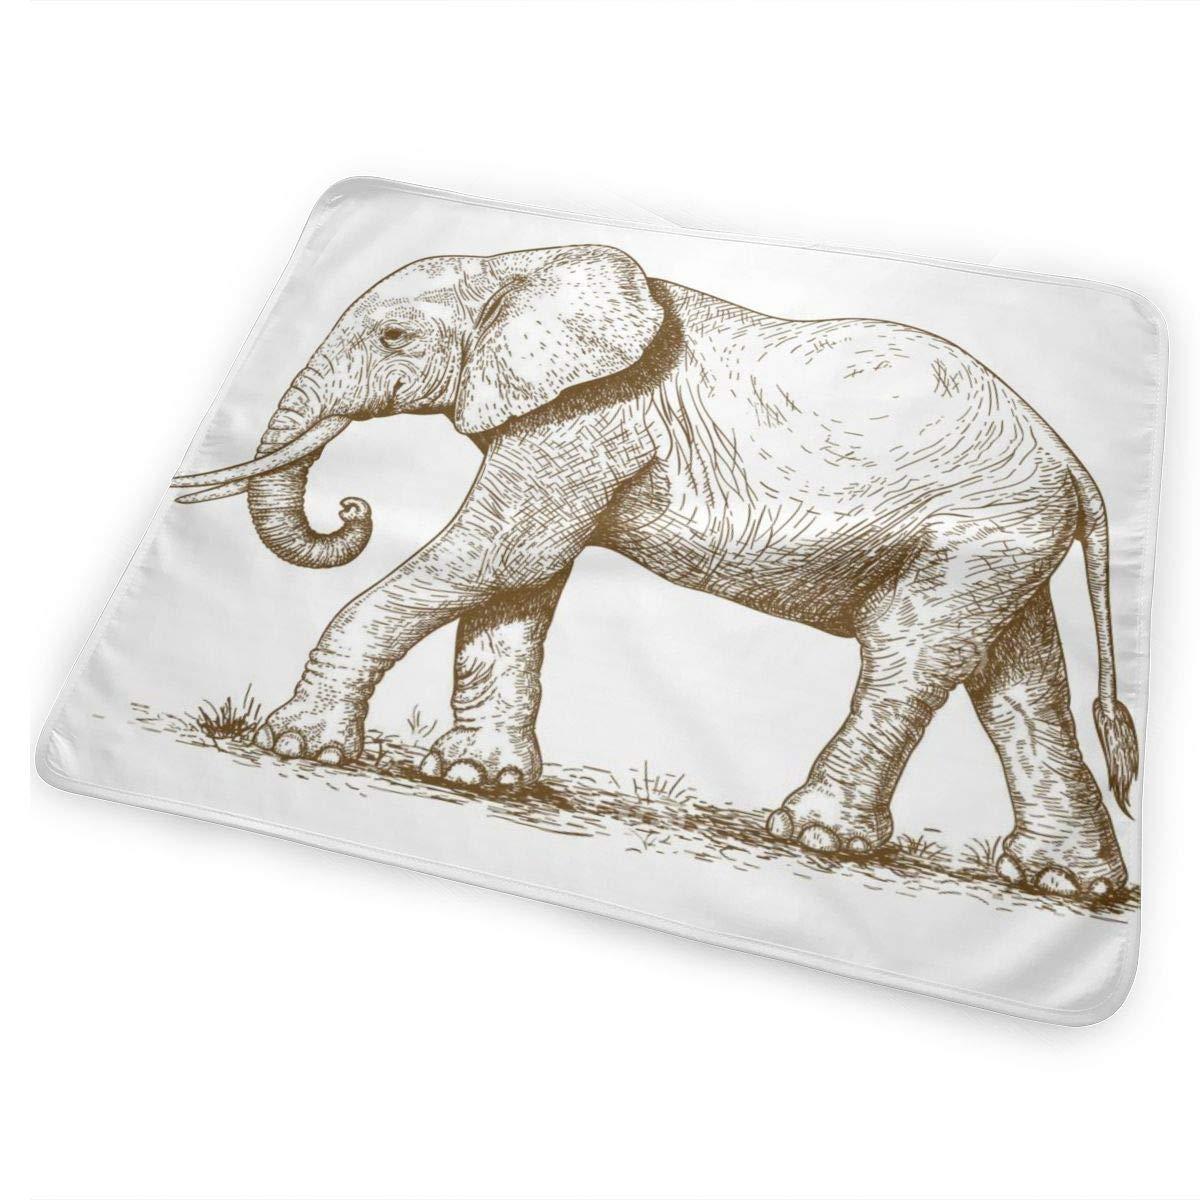 UBSOCKSG Elephant Drawing Print Reusable Changing Mat Portable Waterproof Diaper Changing Travel Home Change Mat Organizer Bag Newborn Multi-Function Storage Bag